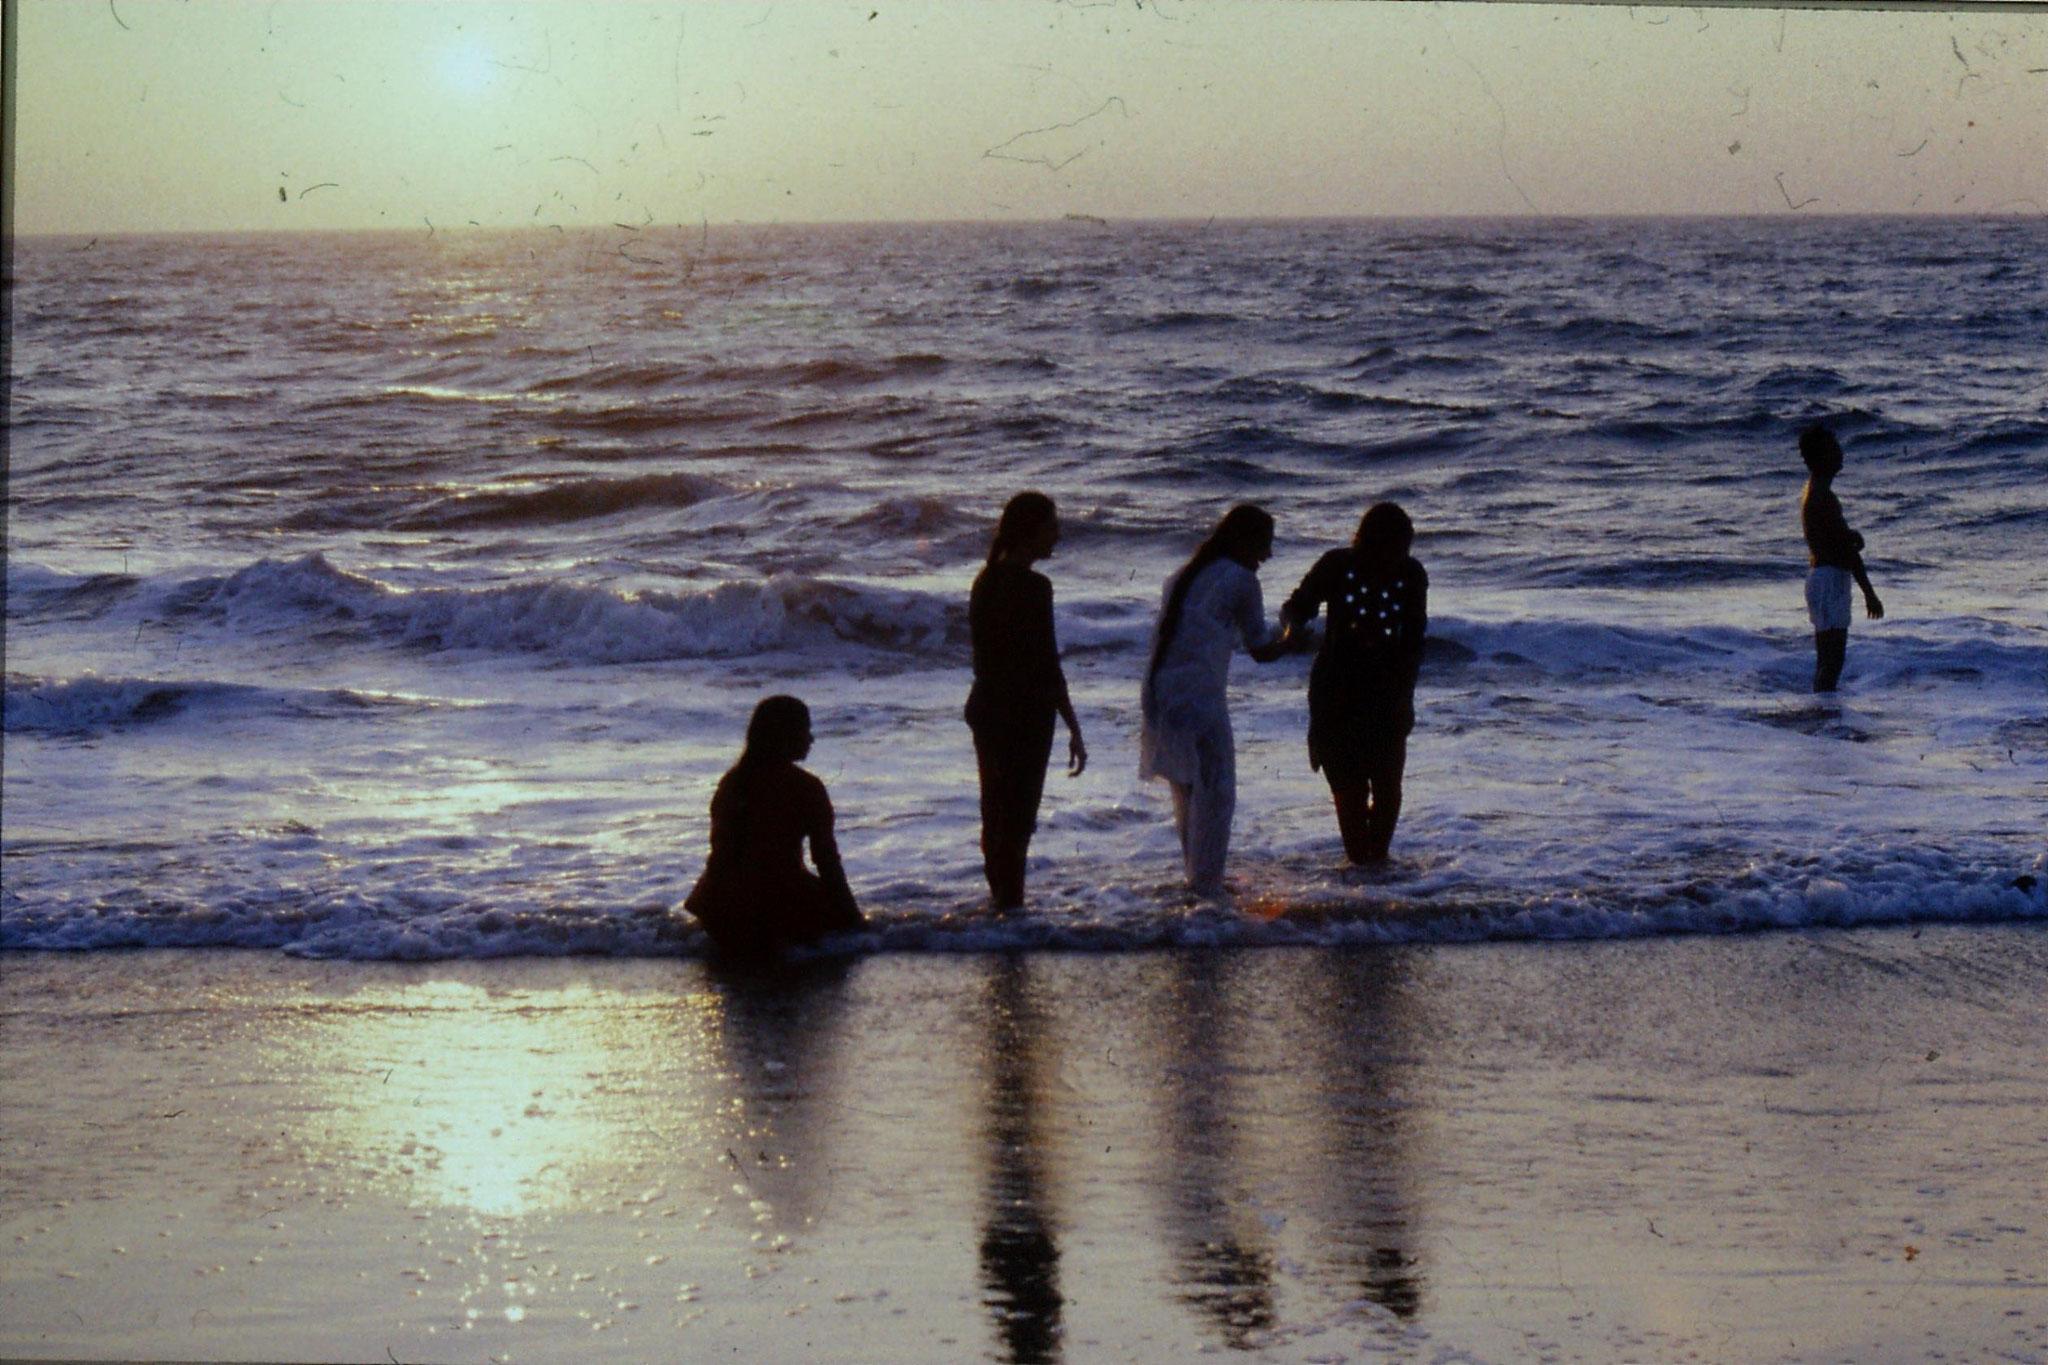 2/1/1990: 17: Calangute beach